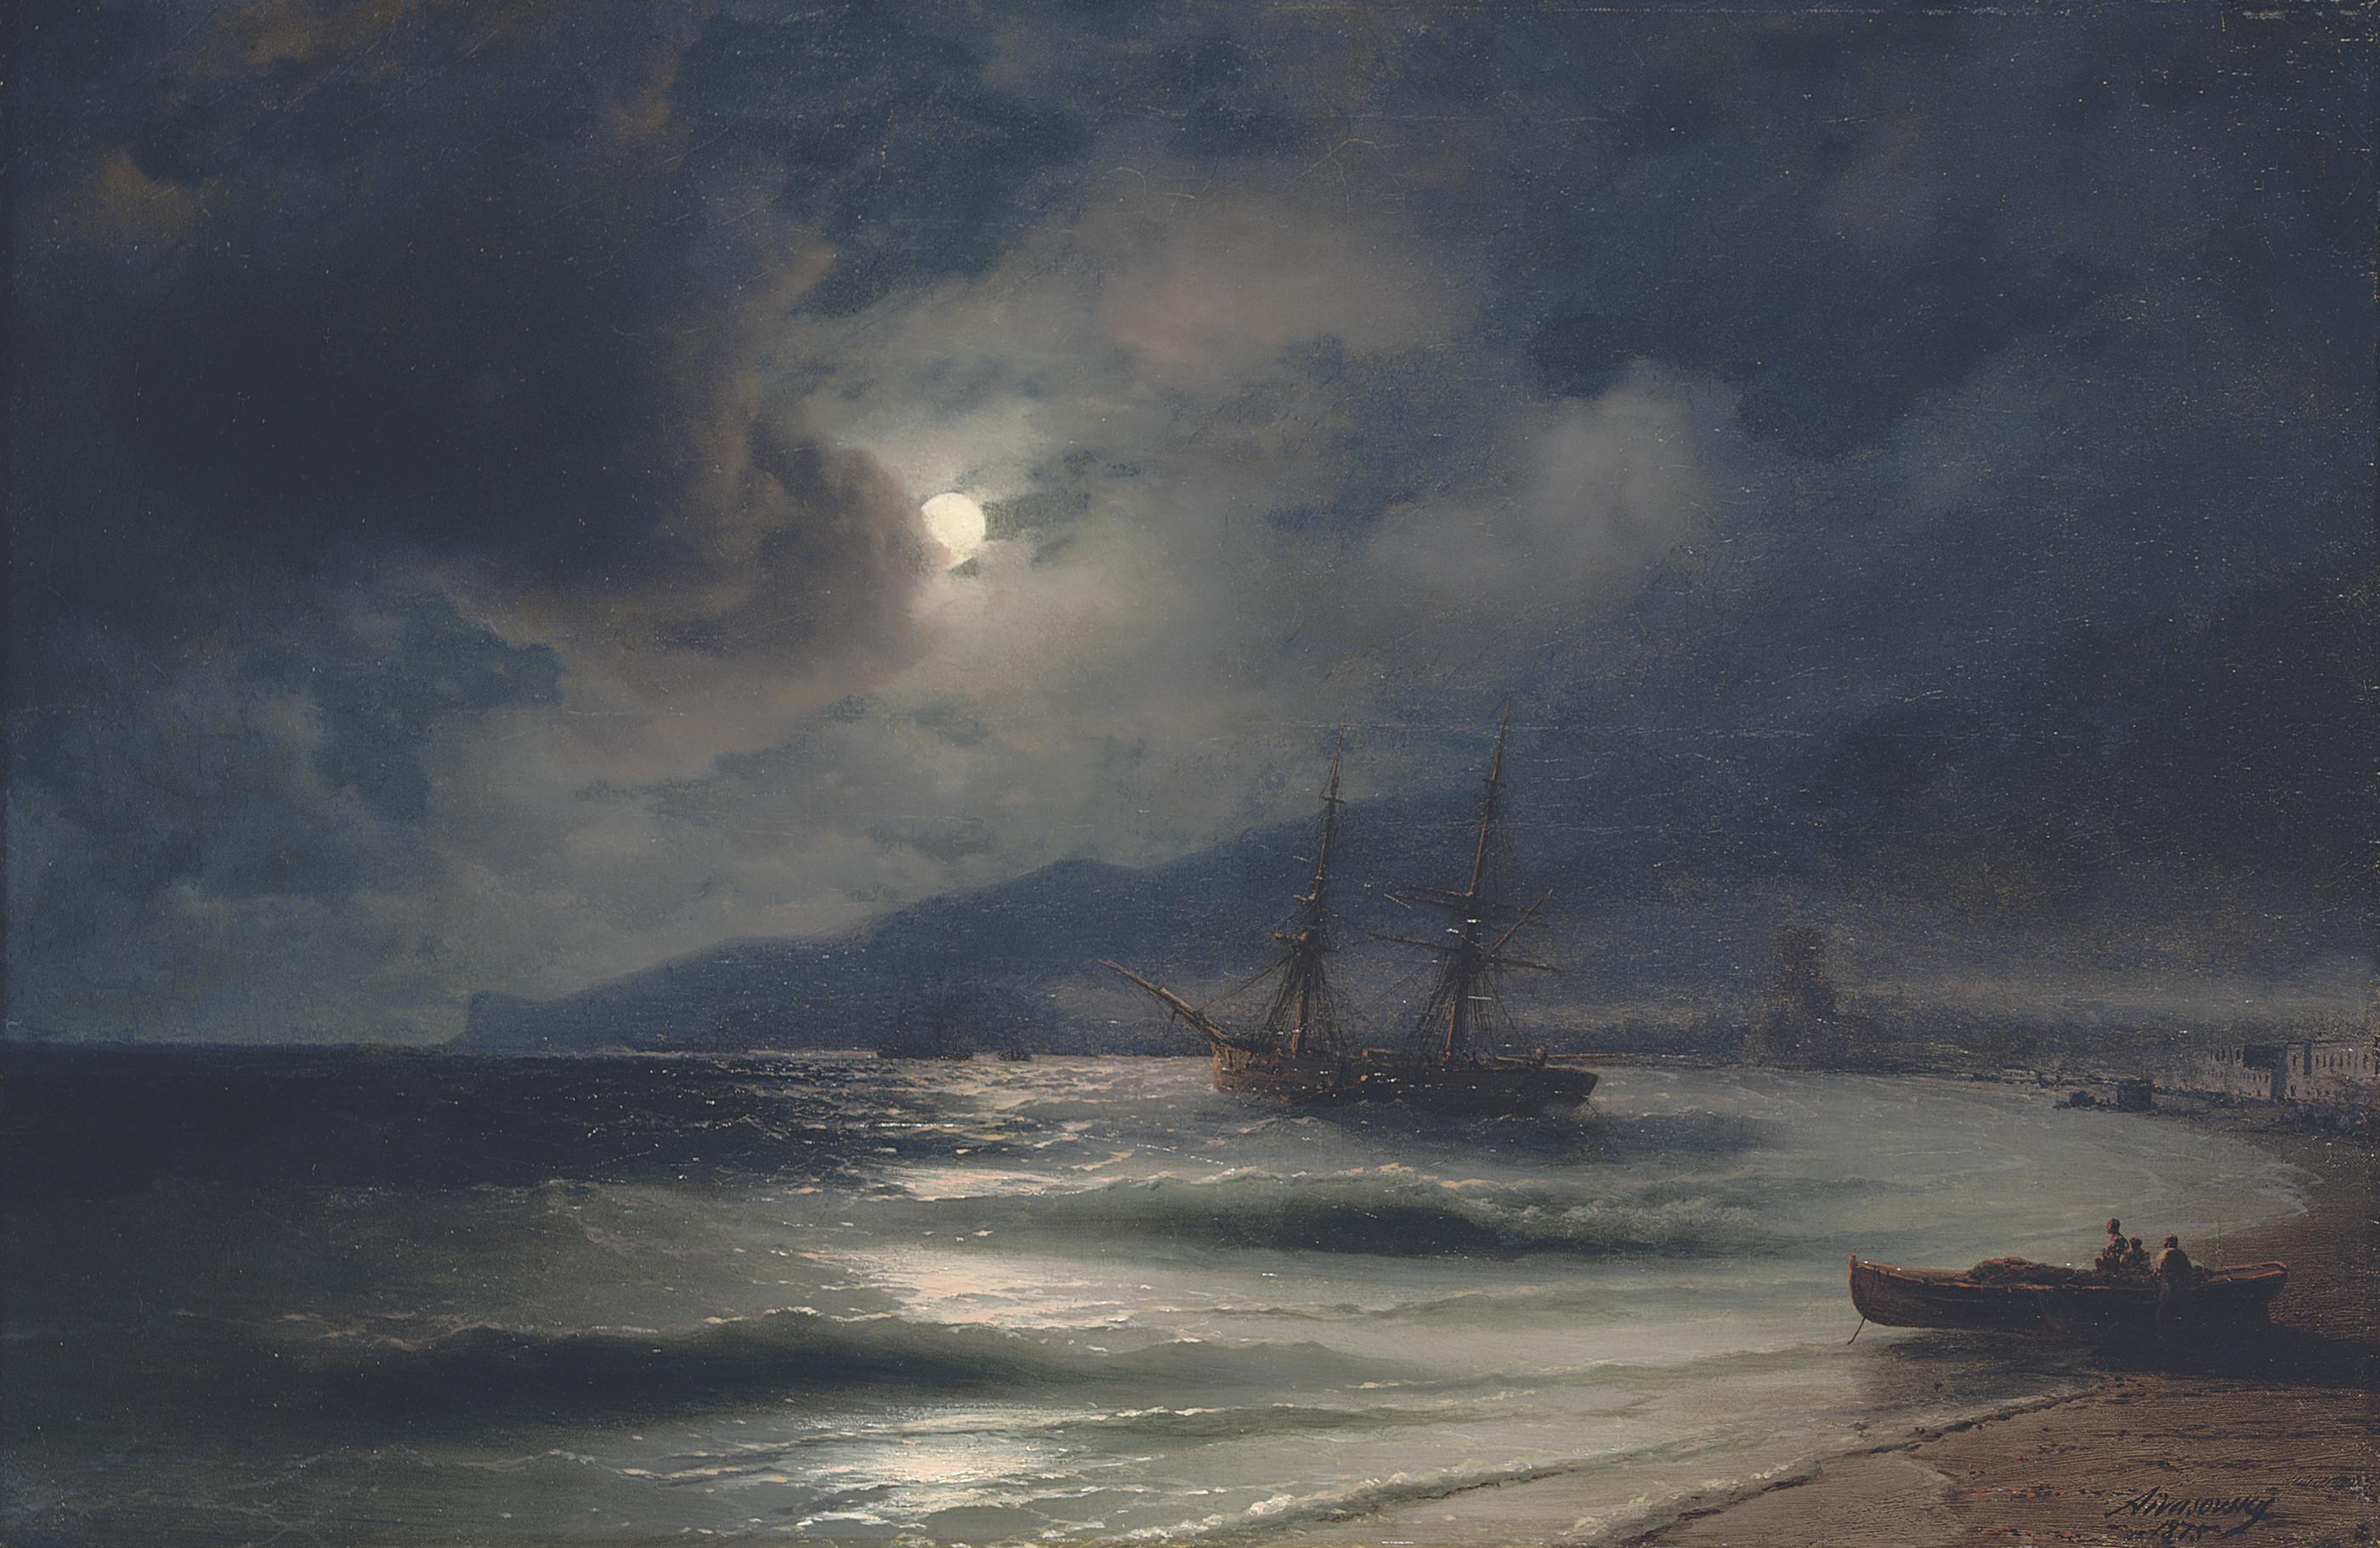 On the coast at night